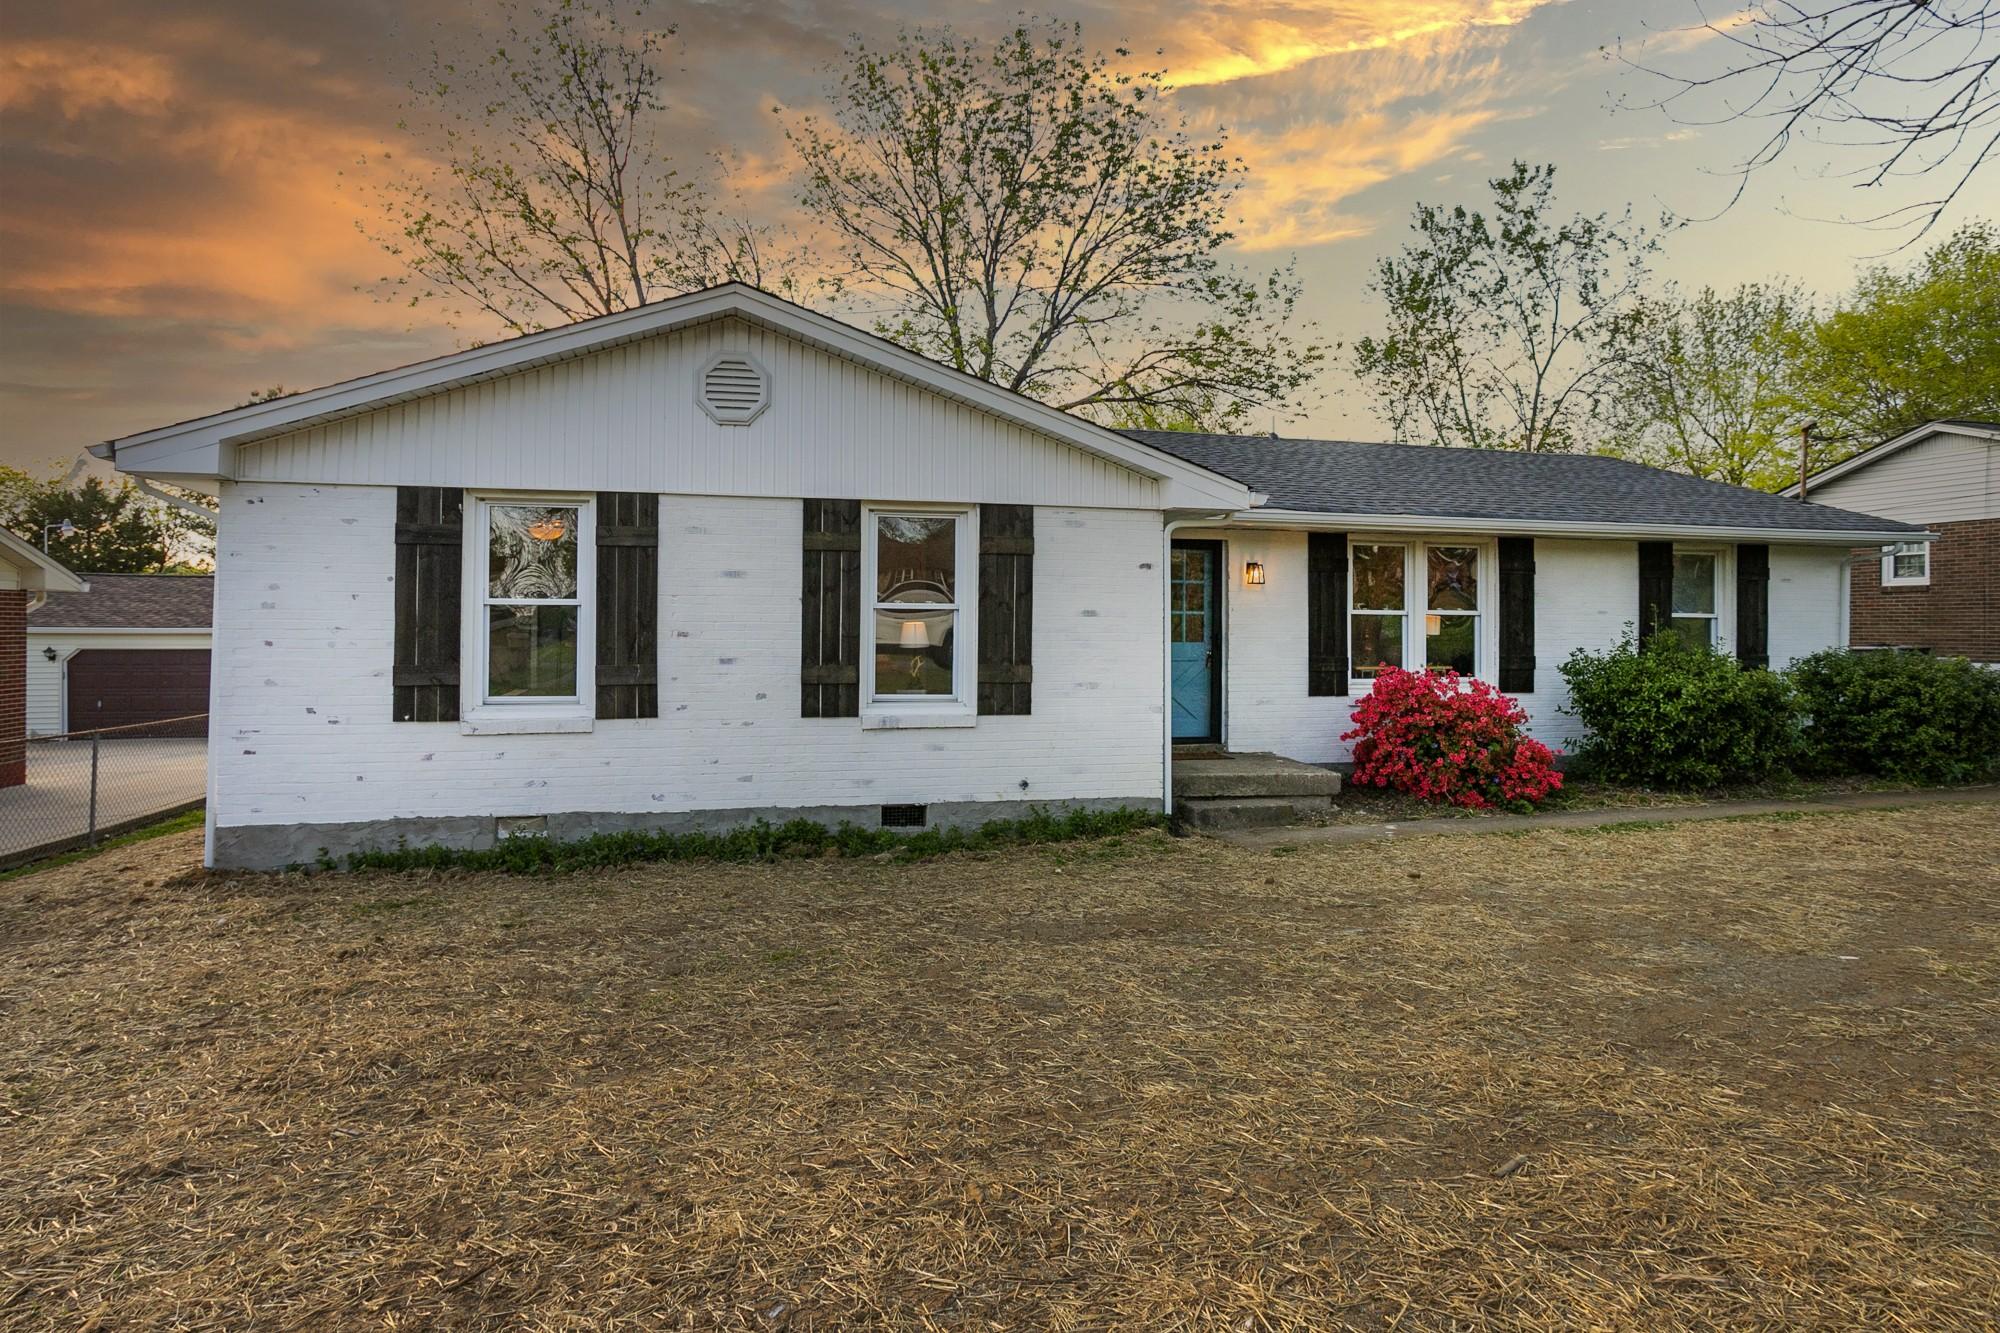 141 Hardaway Dr Property Photo - Goodlettsville, TN real estate listing